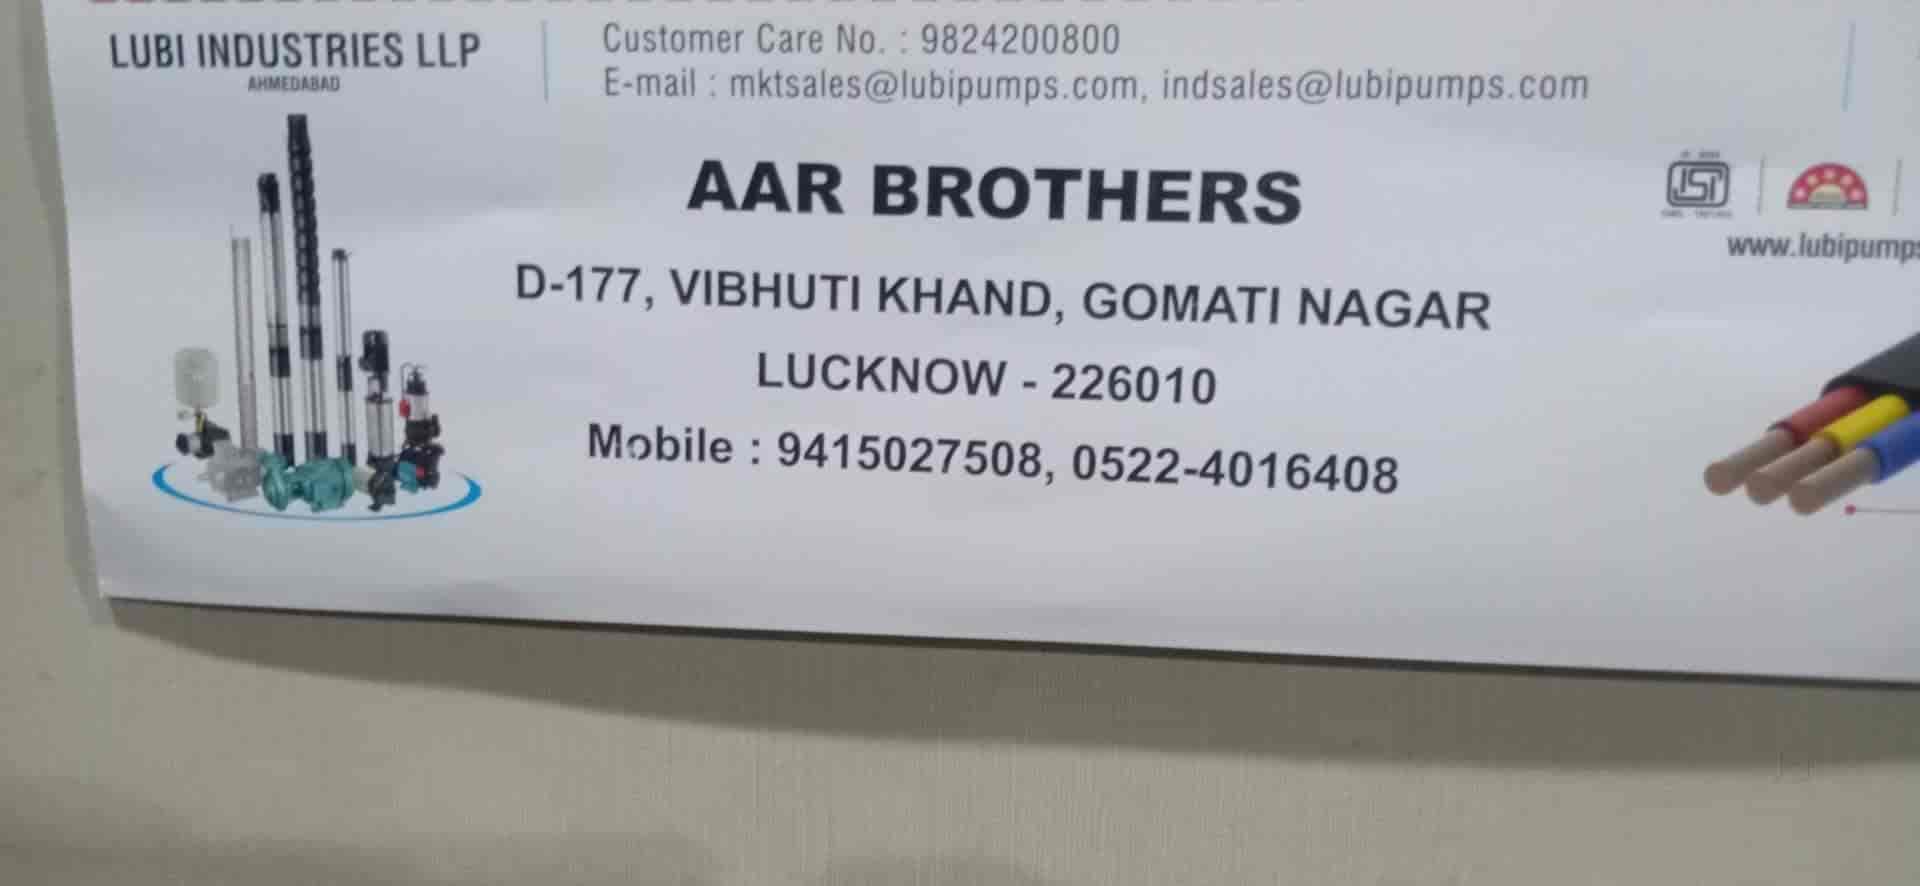 Aar Brothers